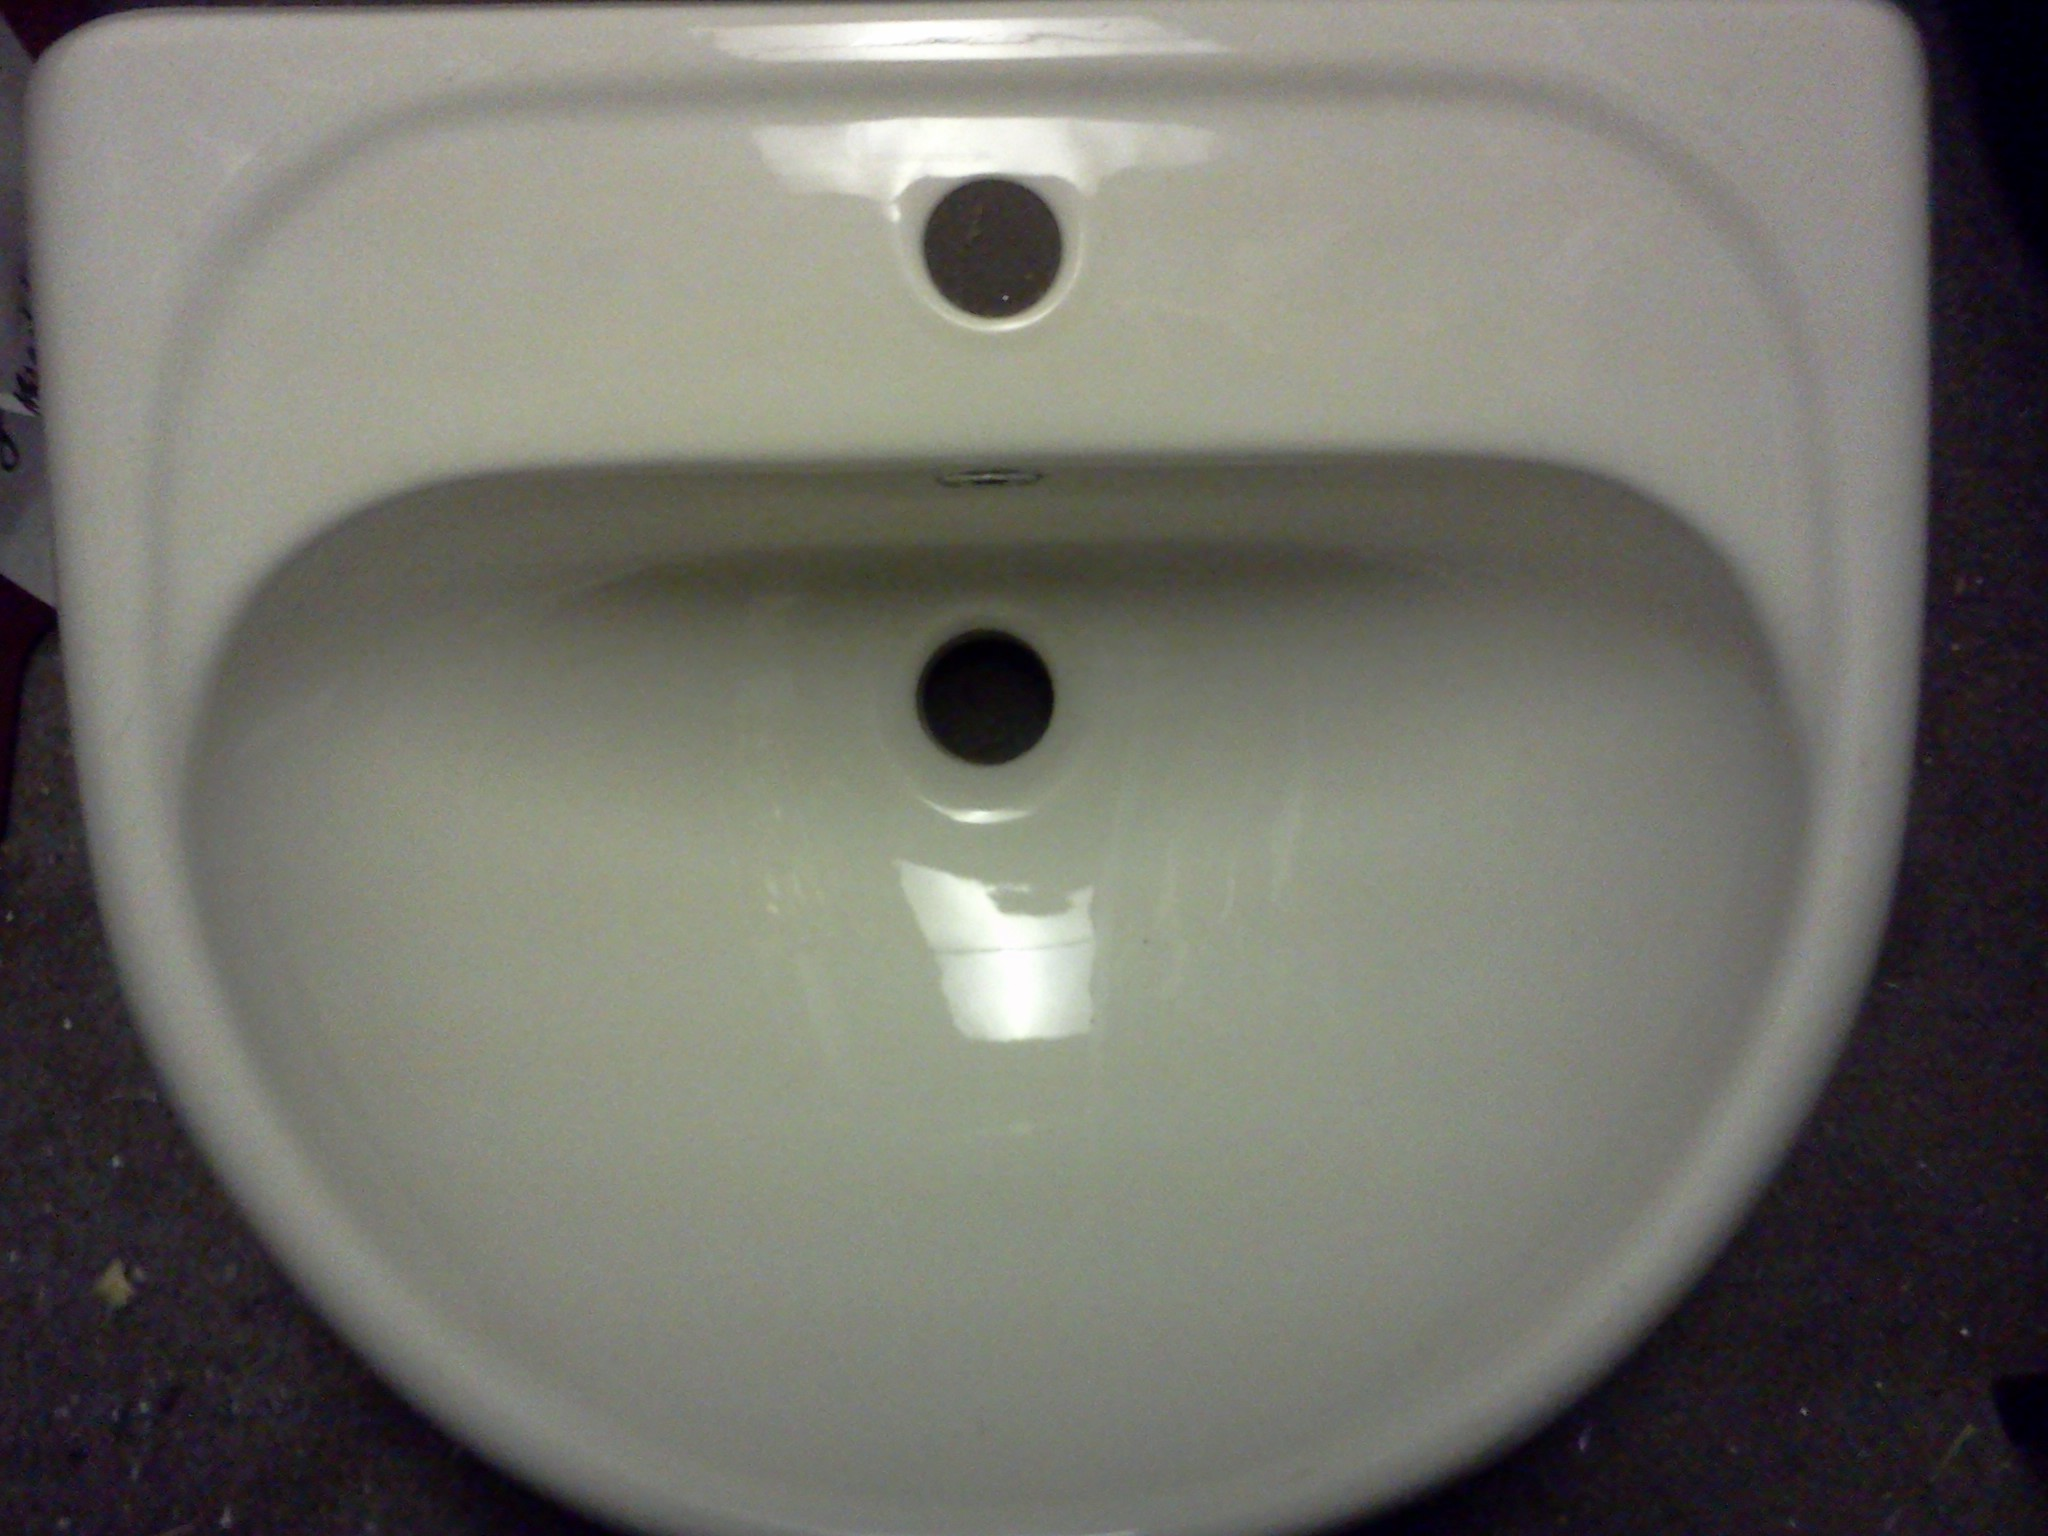 Pergamon Colour Bathrooms UK. Baths Basins Vanity Seat Panels